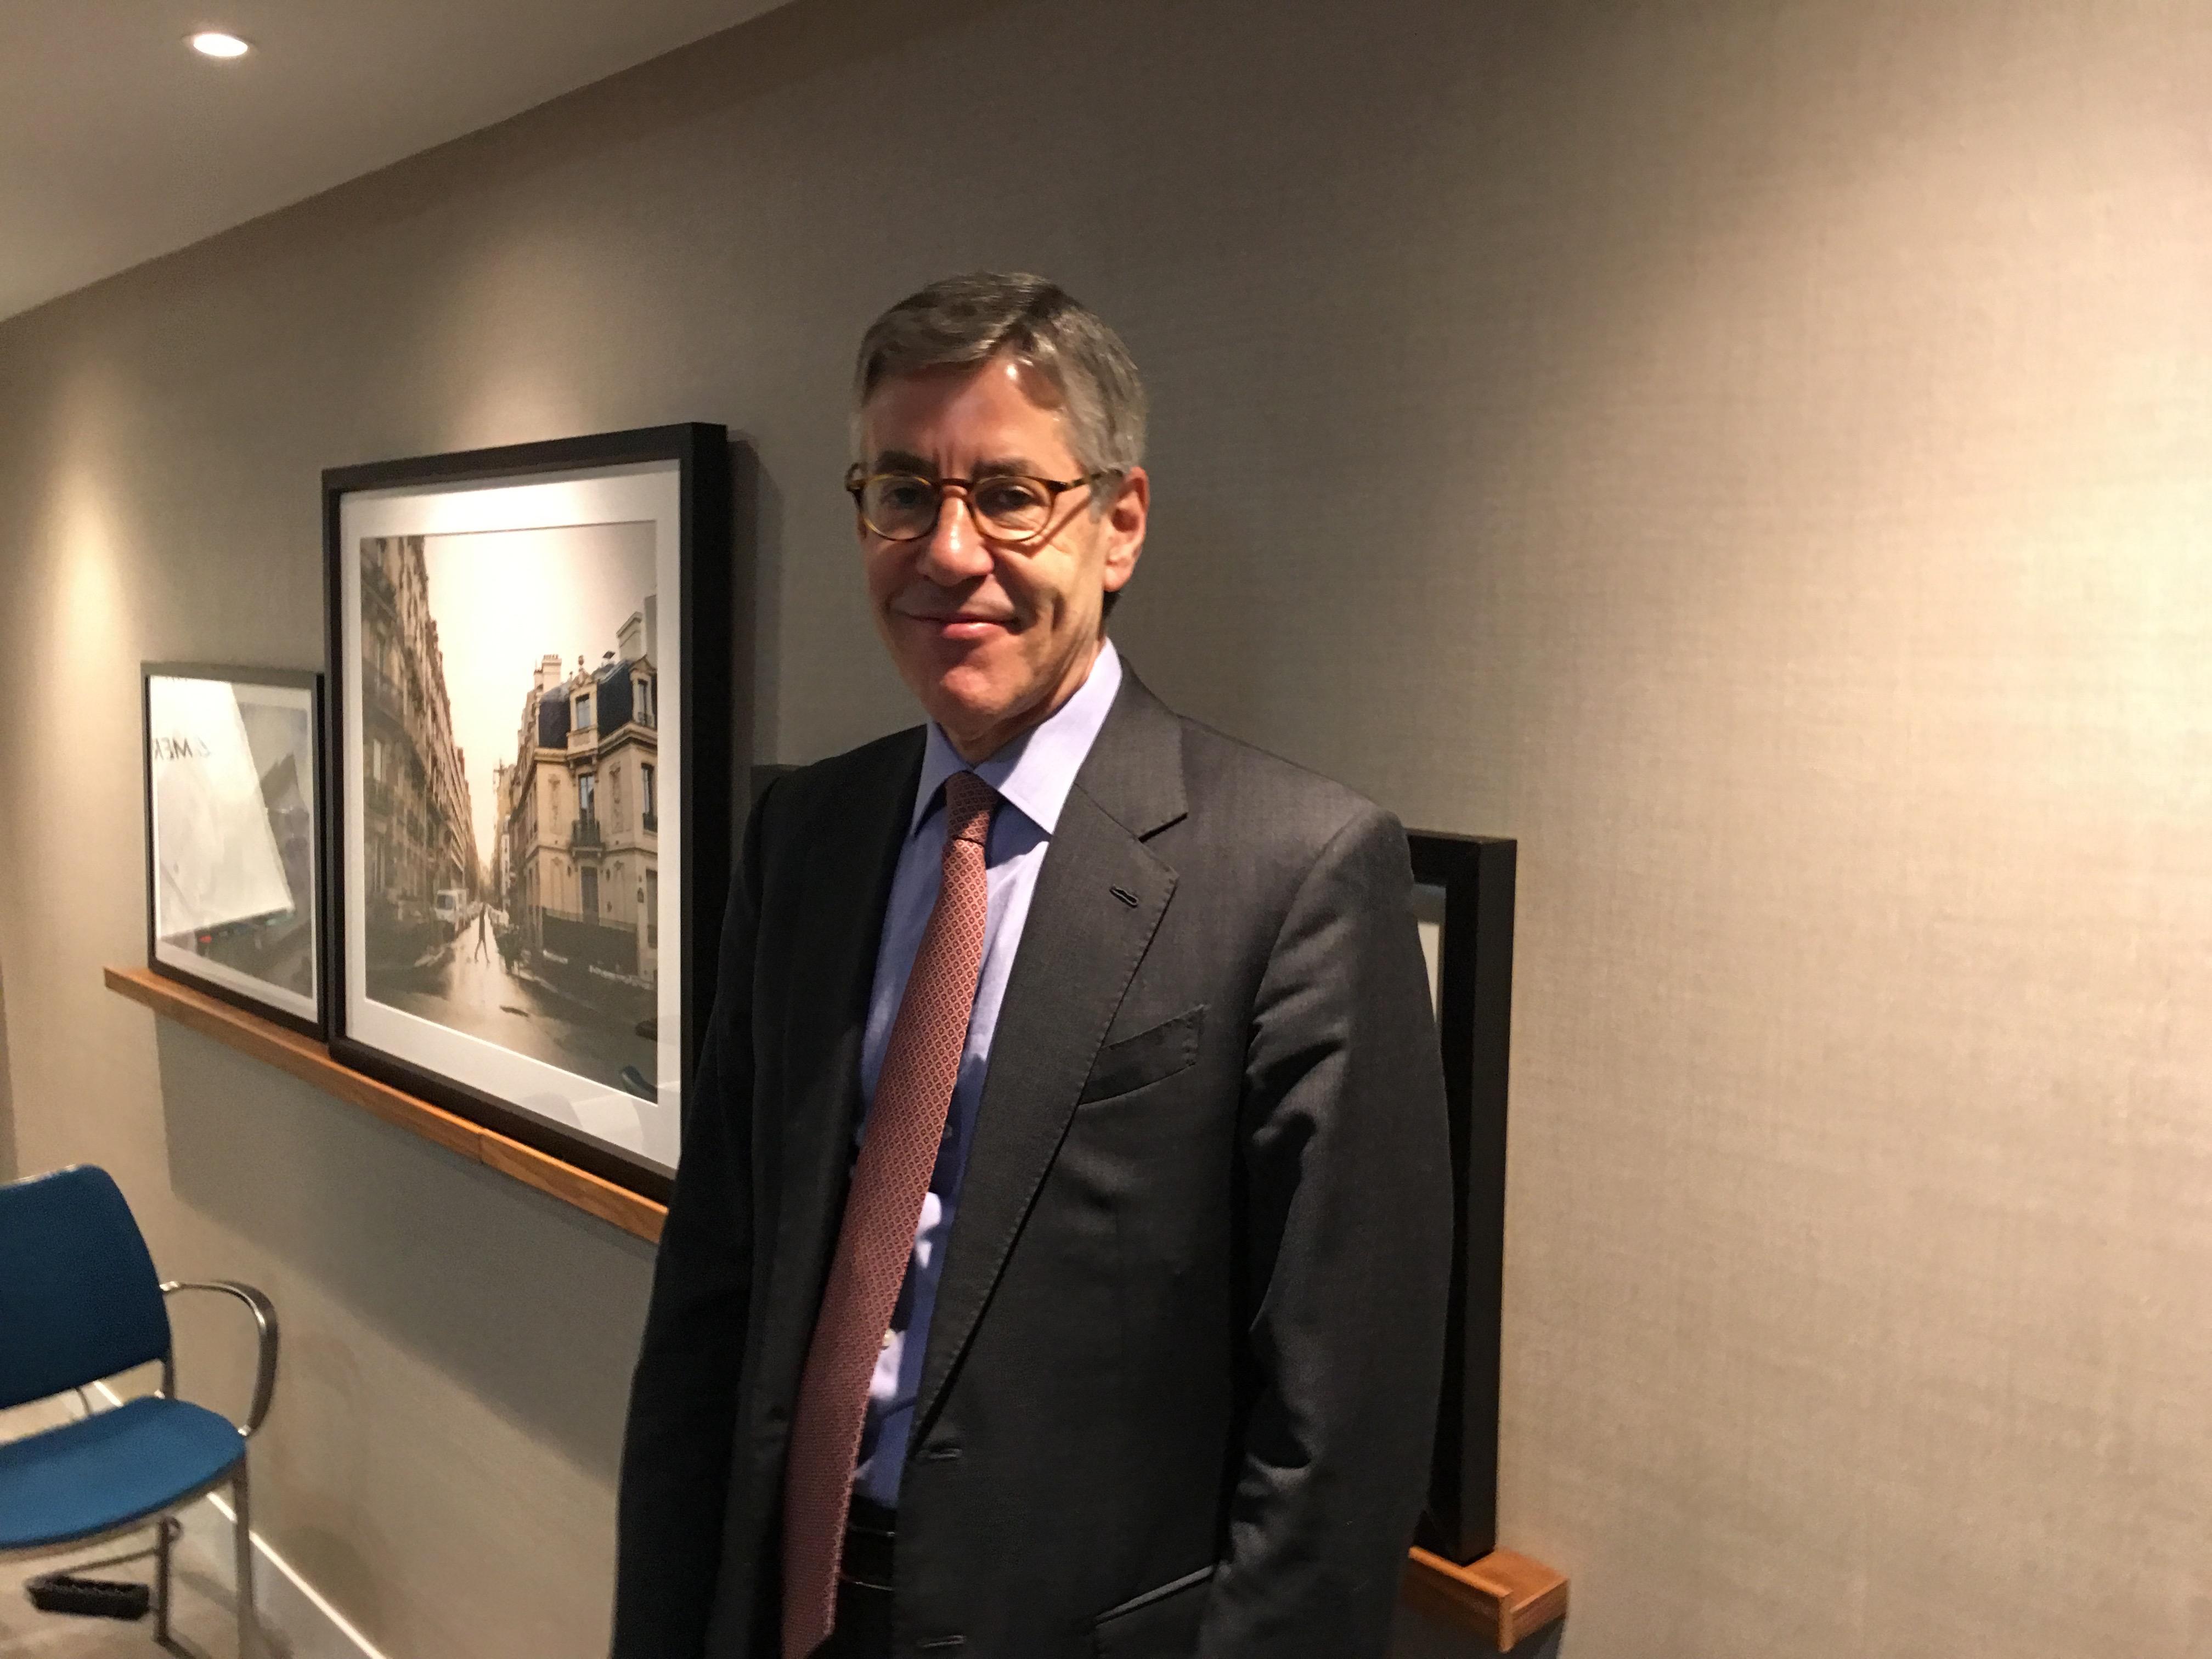 Philip Burchard, CEO Merz Aesthetics